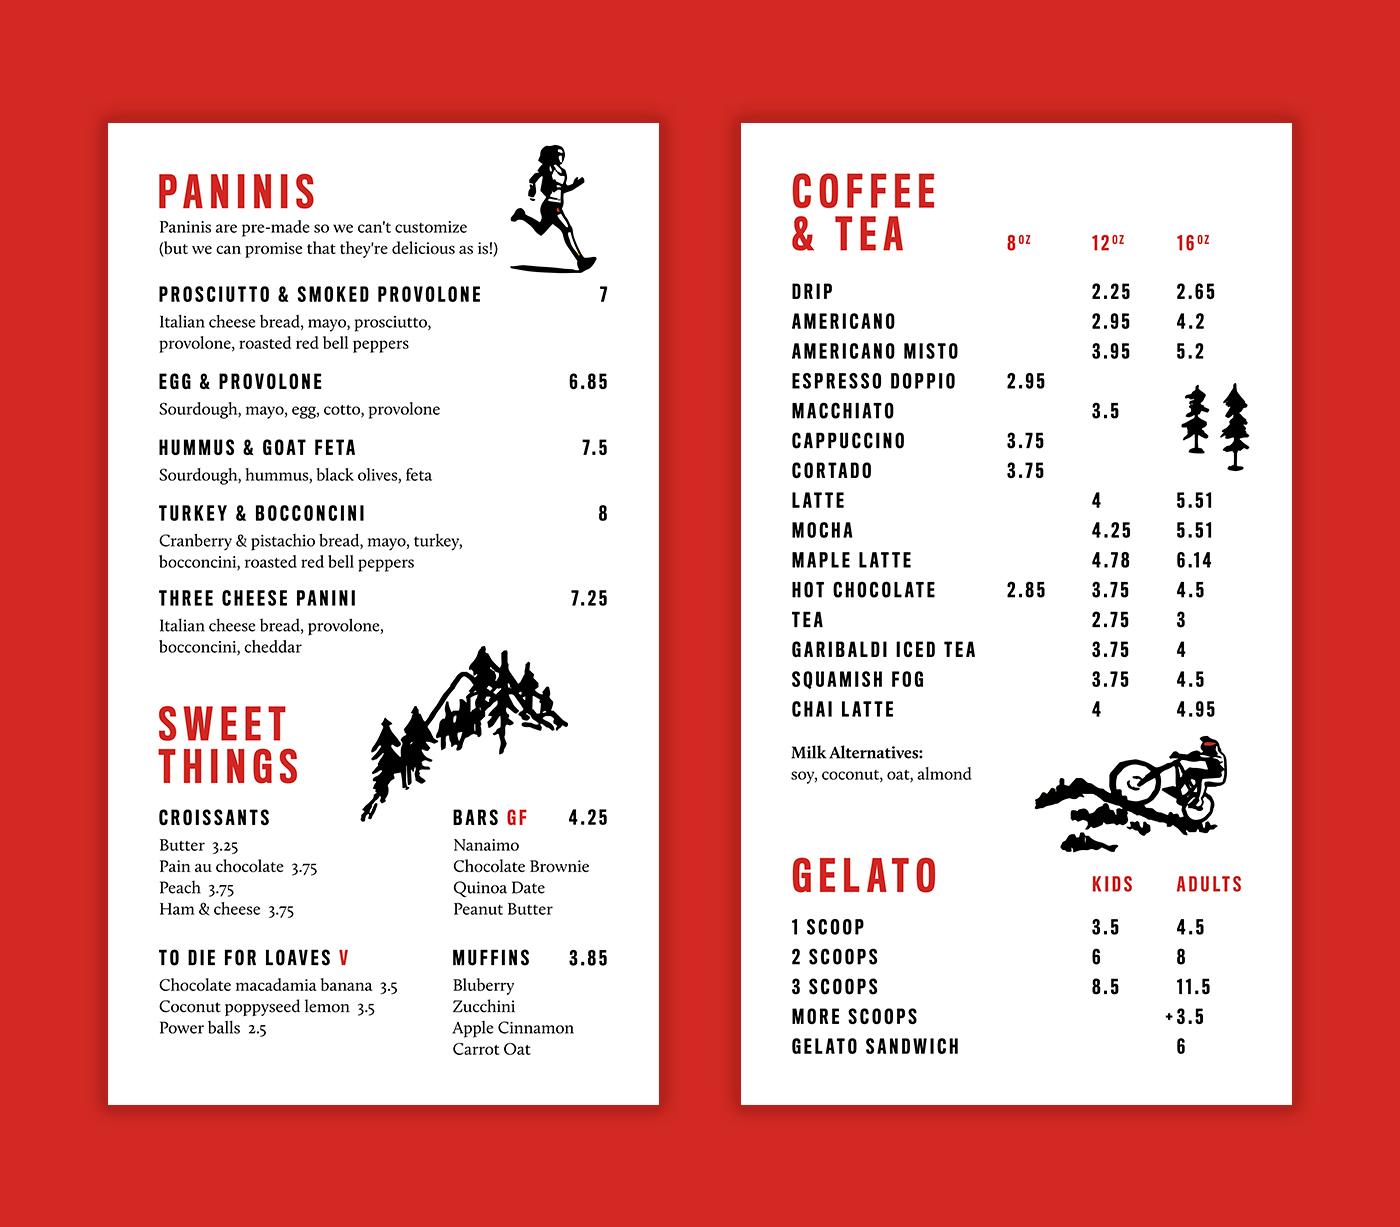 Caffe Garibaldi menu board design by Vancouver-based creative collective, Flipside Creative.